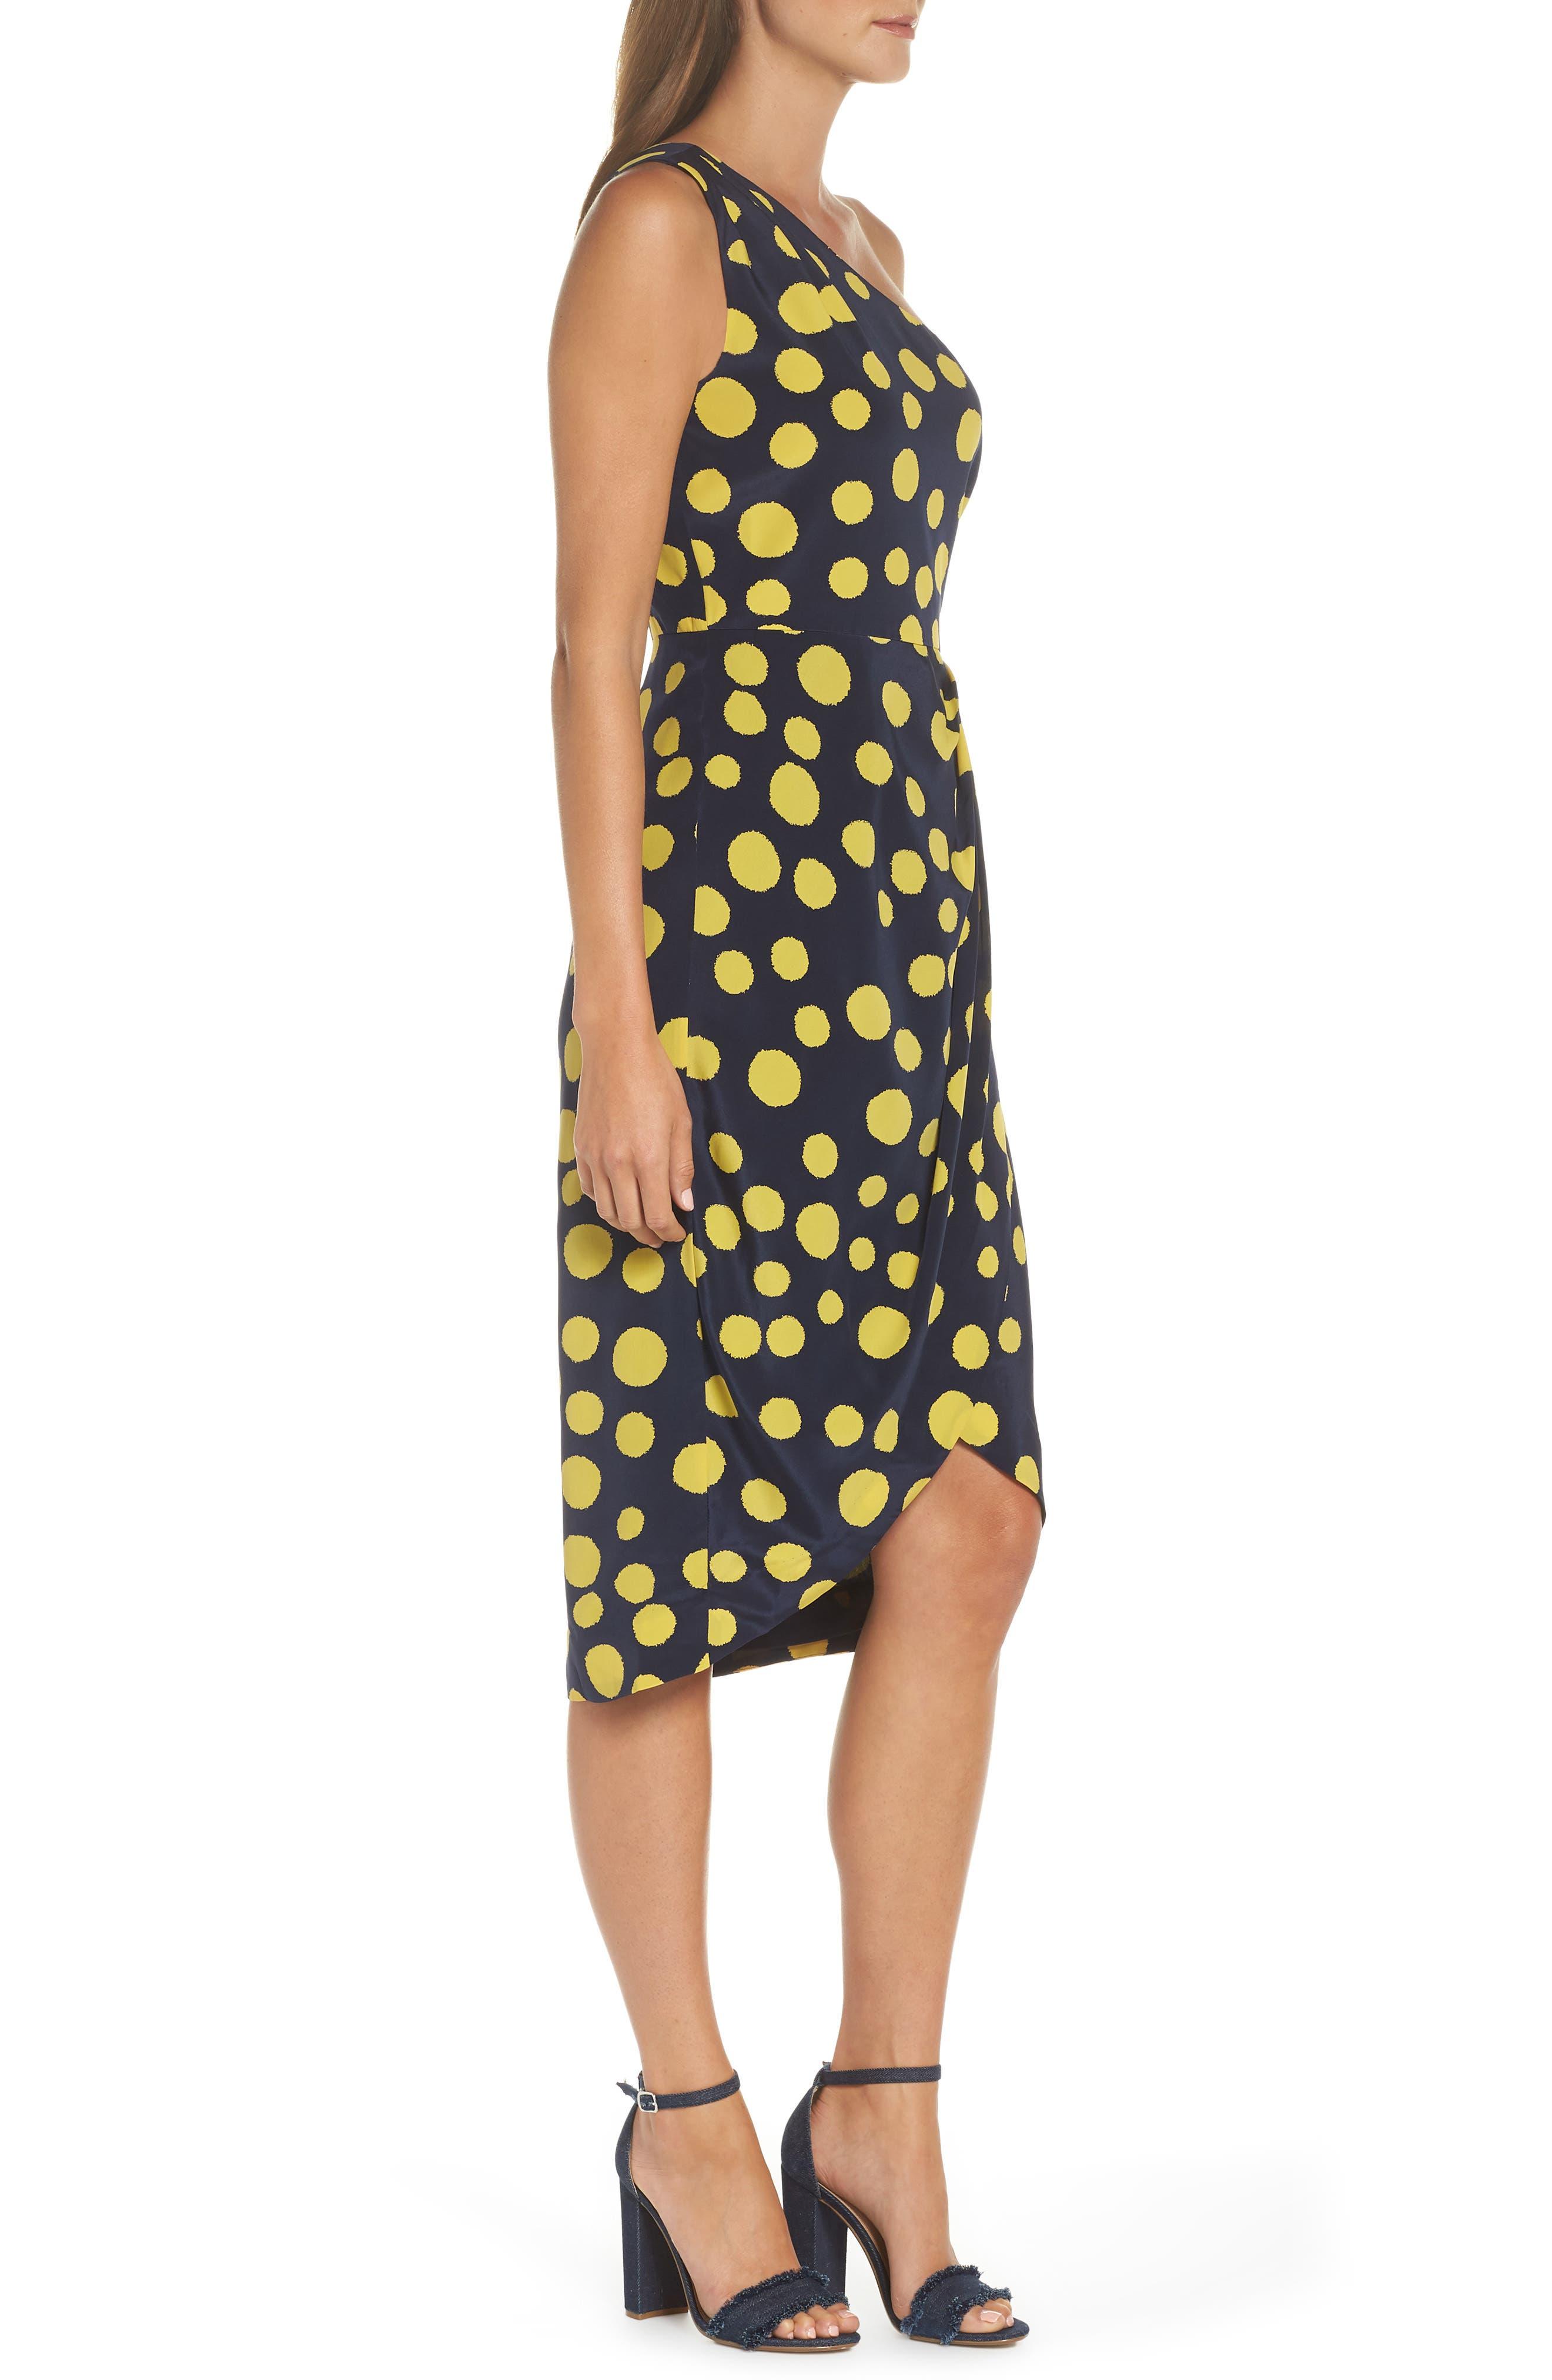 J.CREW,                             Polka Dot One-Shoulder Silk Dress,                             Alternate thumbnail 3, color,                             401